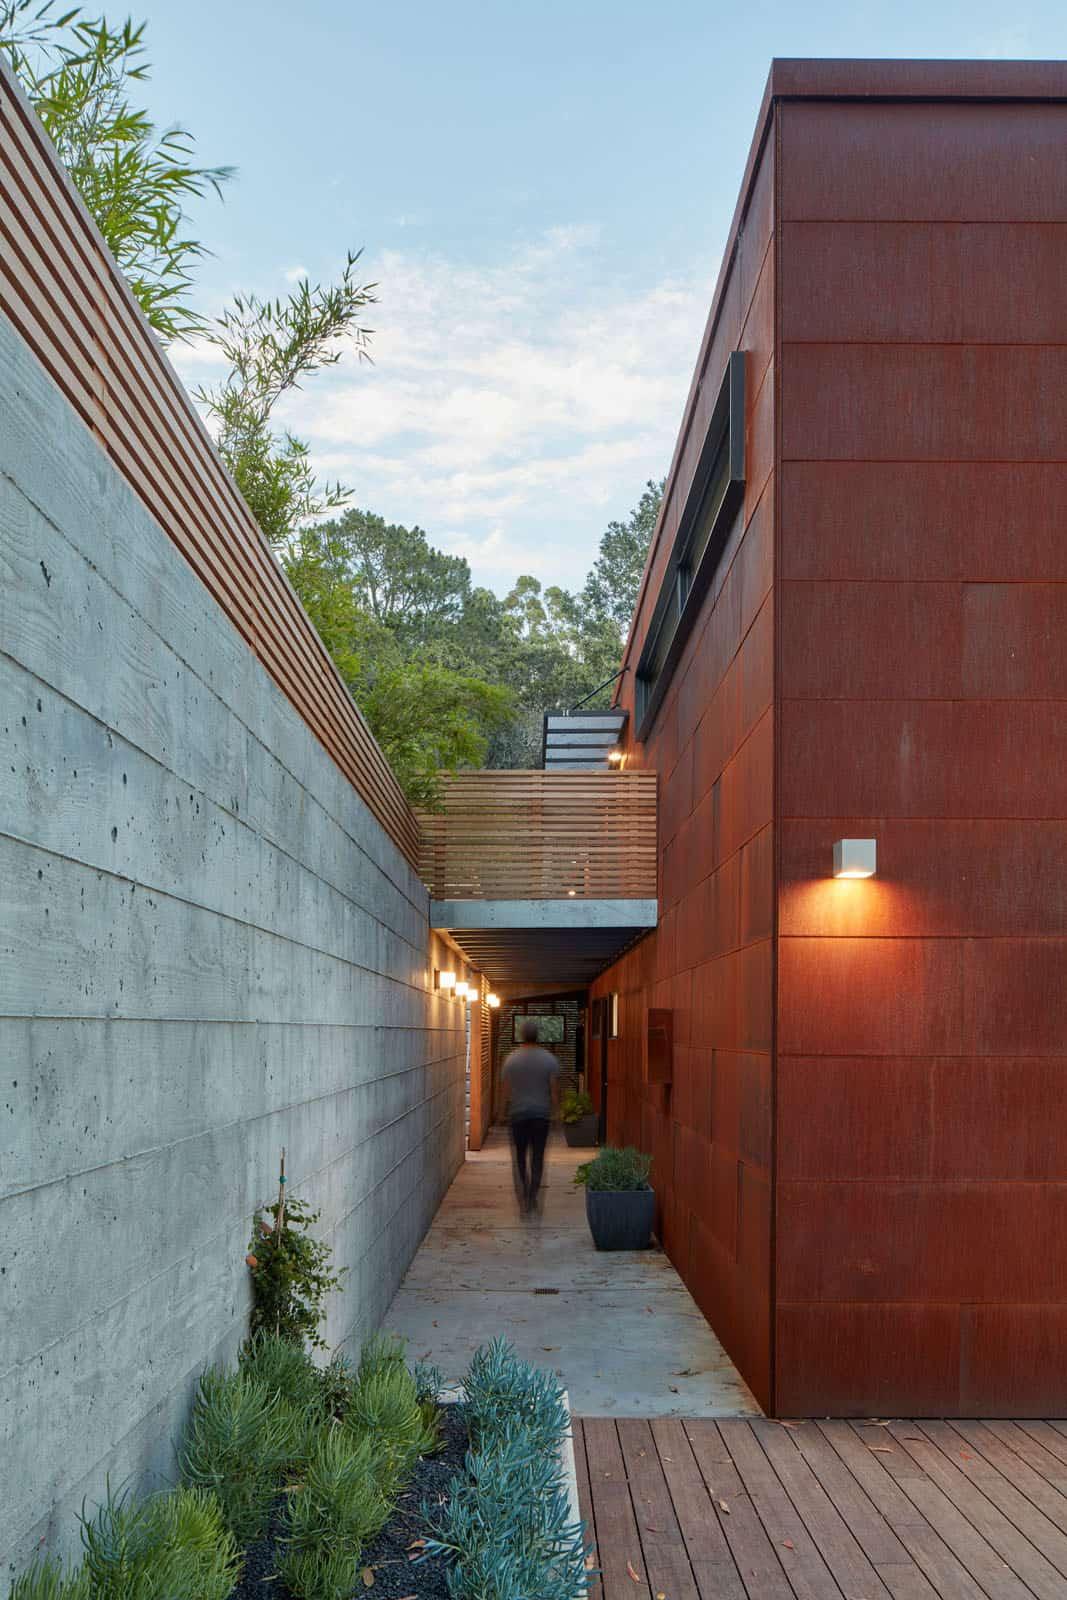 441 Tamalpais Ave | Hillside House by Zack de Vito (22)